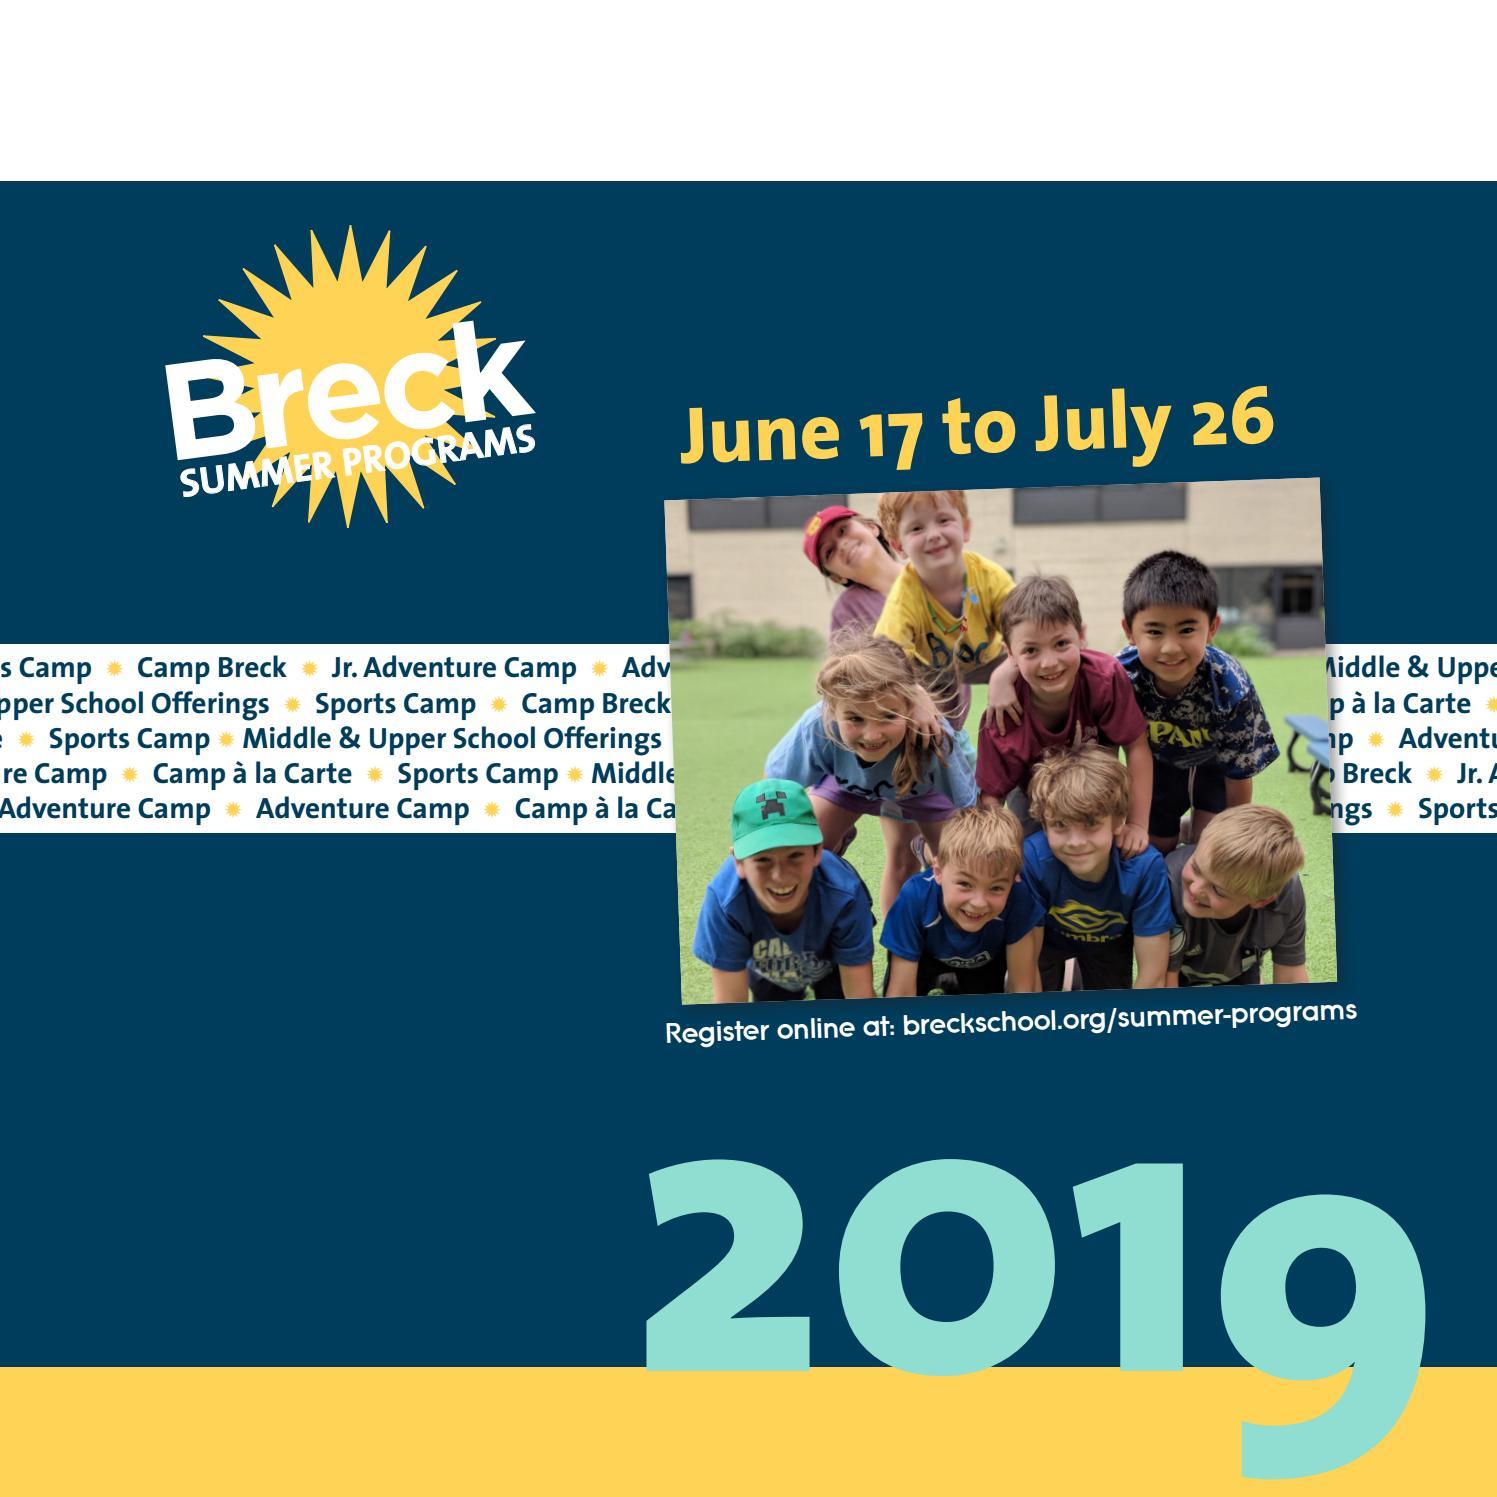 Breck Summer Programs 2019 By Breck School Issuu